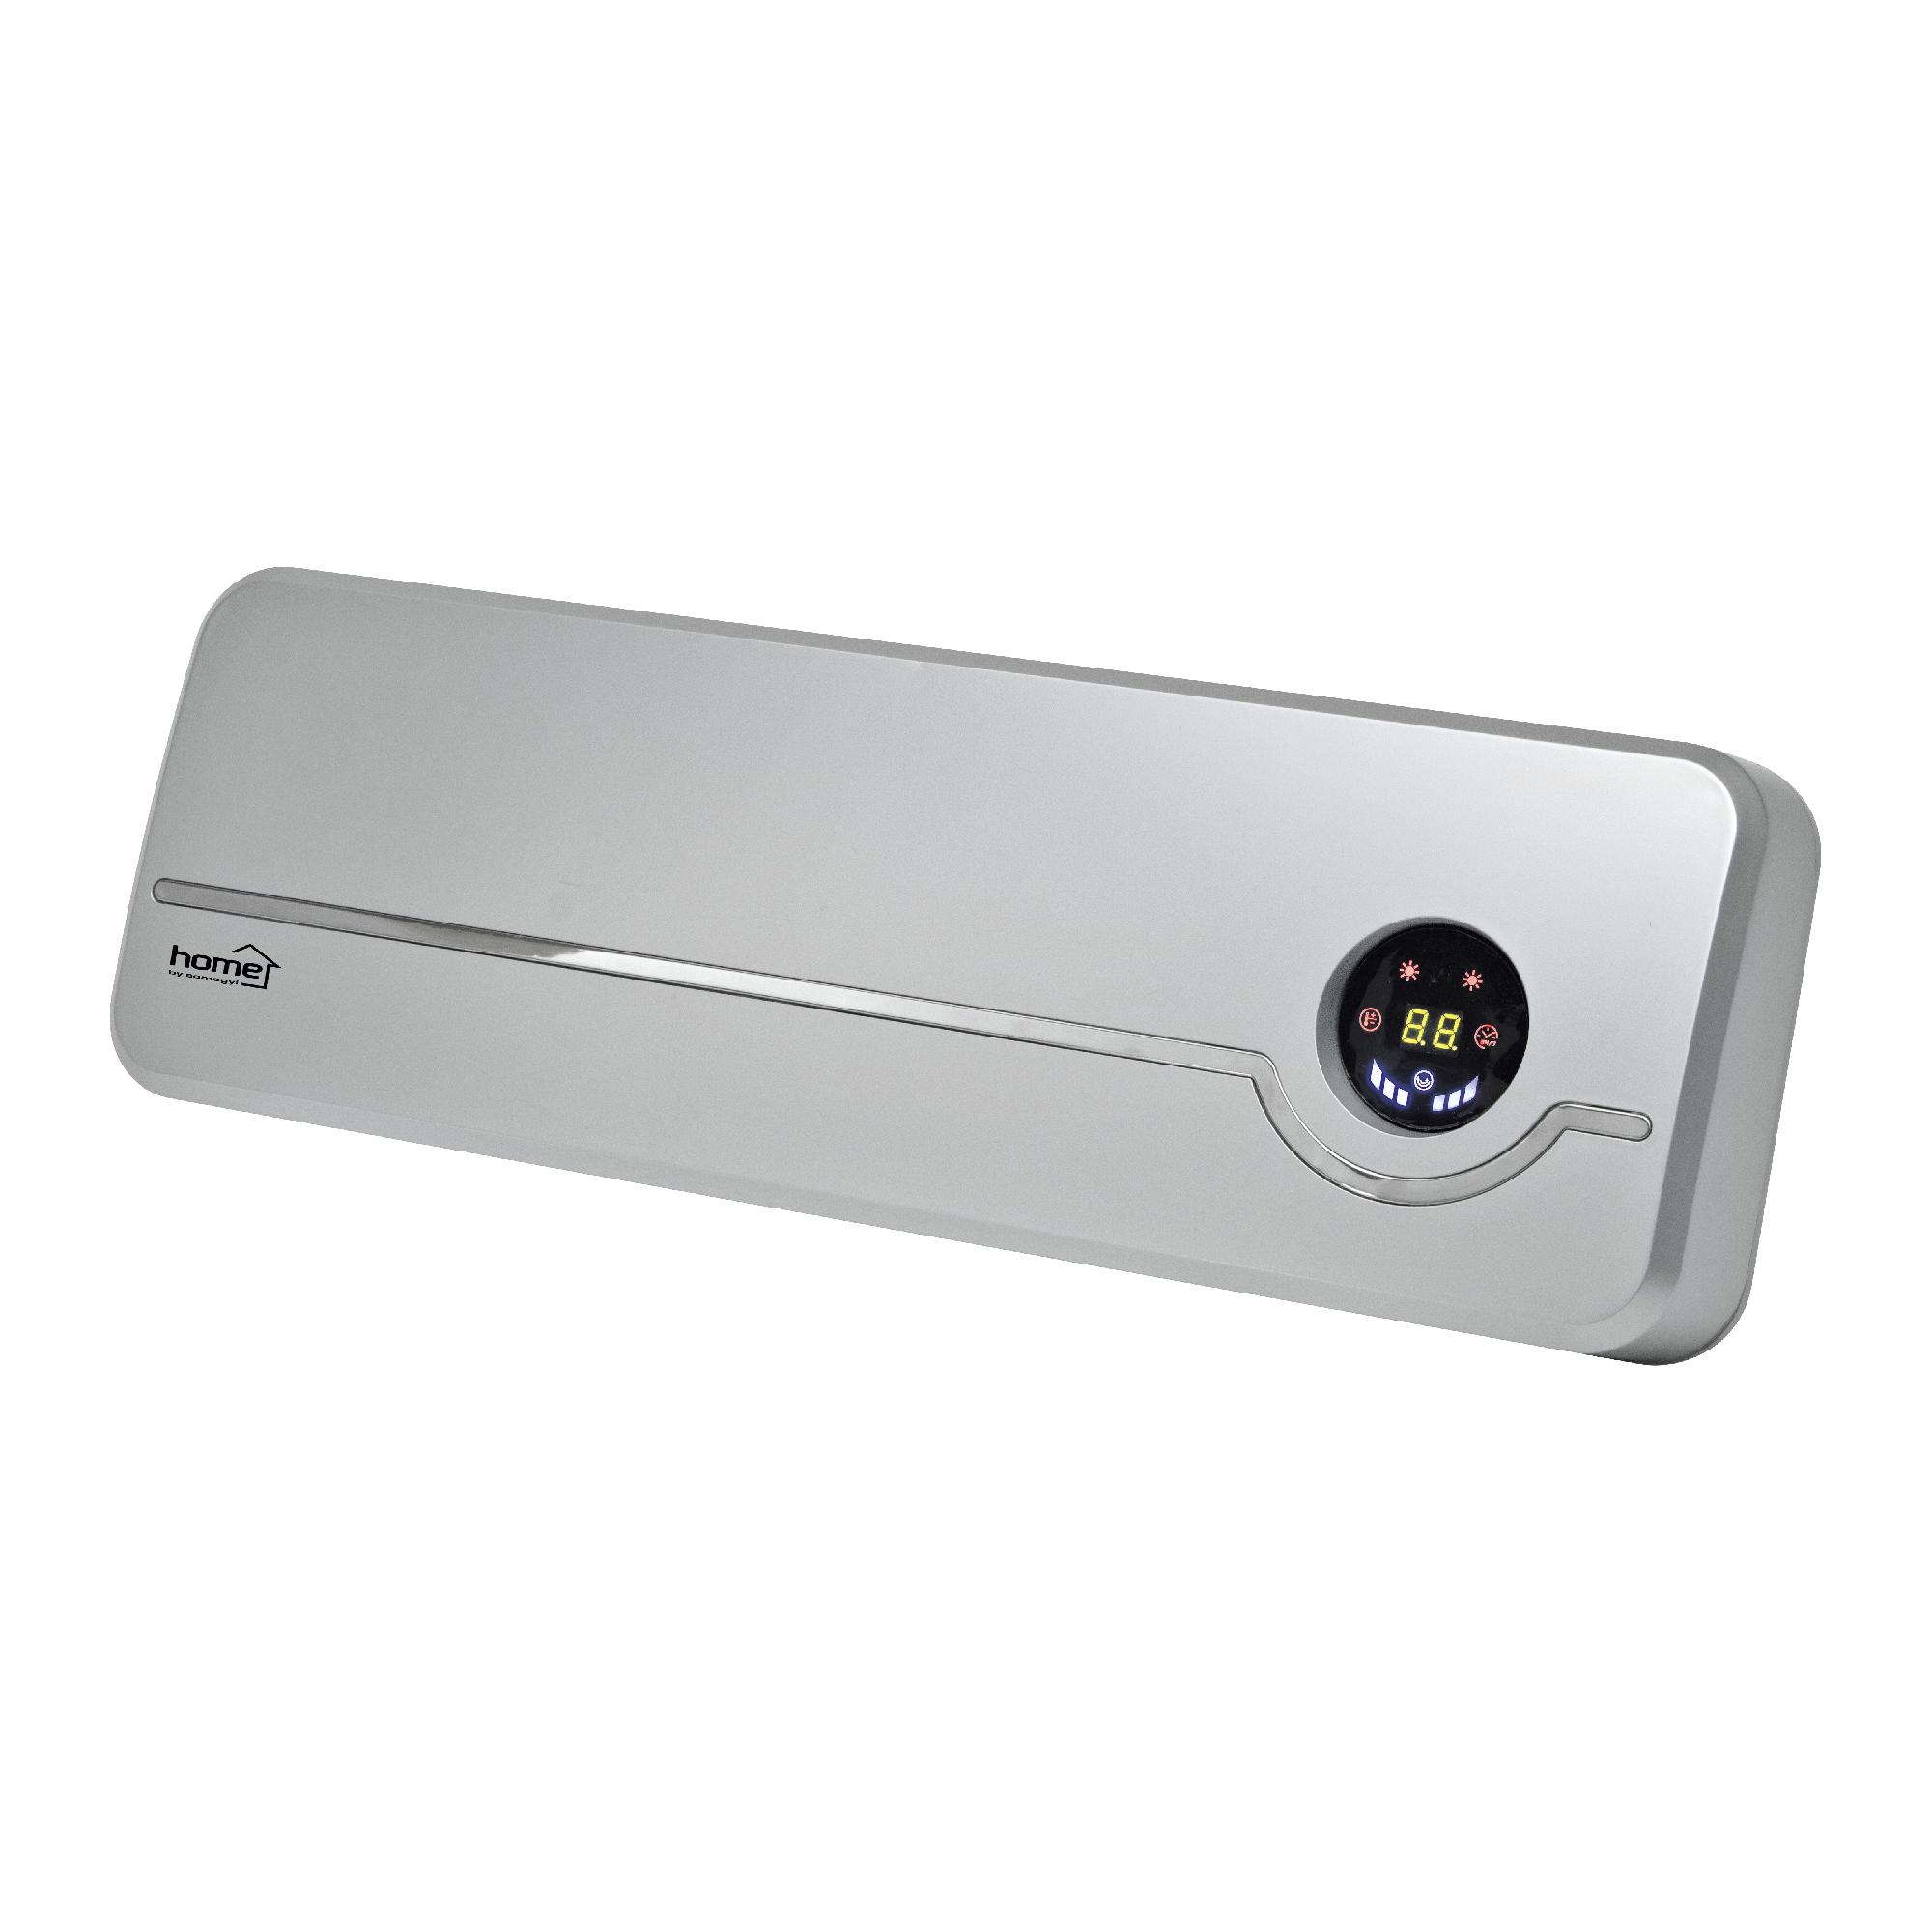 Aeroterma de perete cu ventilator FKF 56202 Home by Somogyi, 2000W , 2 trepte, termostat electronic, oprire automata, IP20, 56 x 19 x 12 cm imagine 2021 mathaus